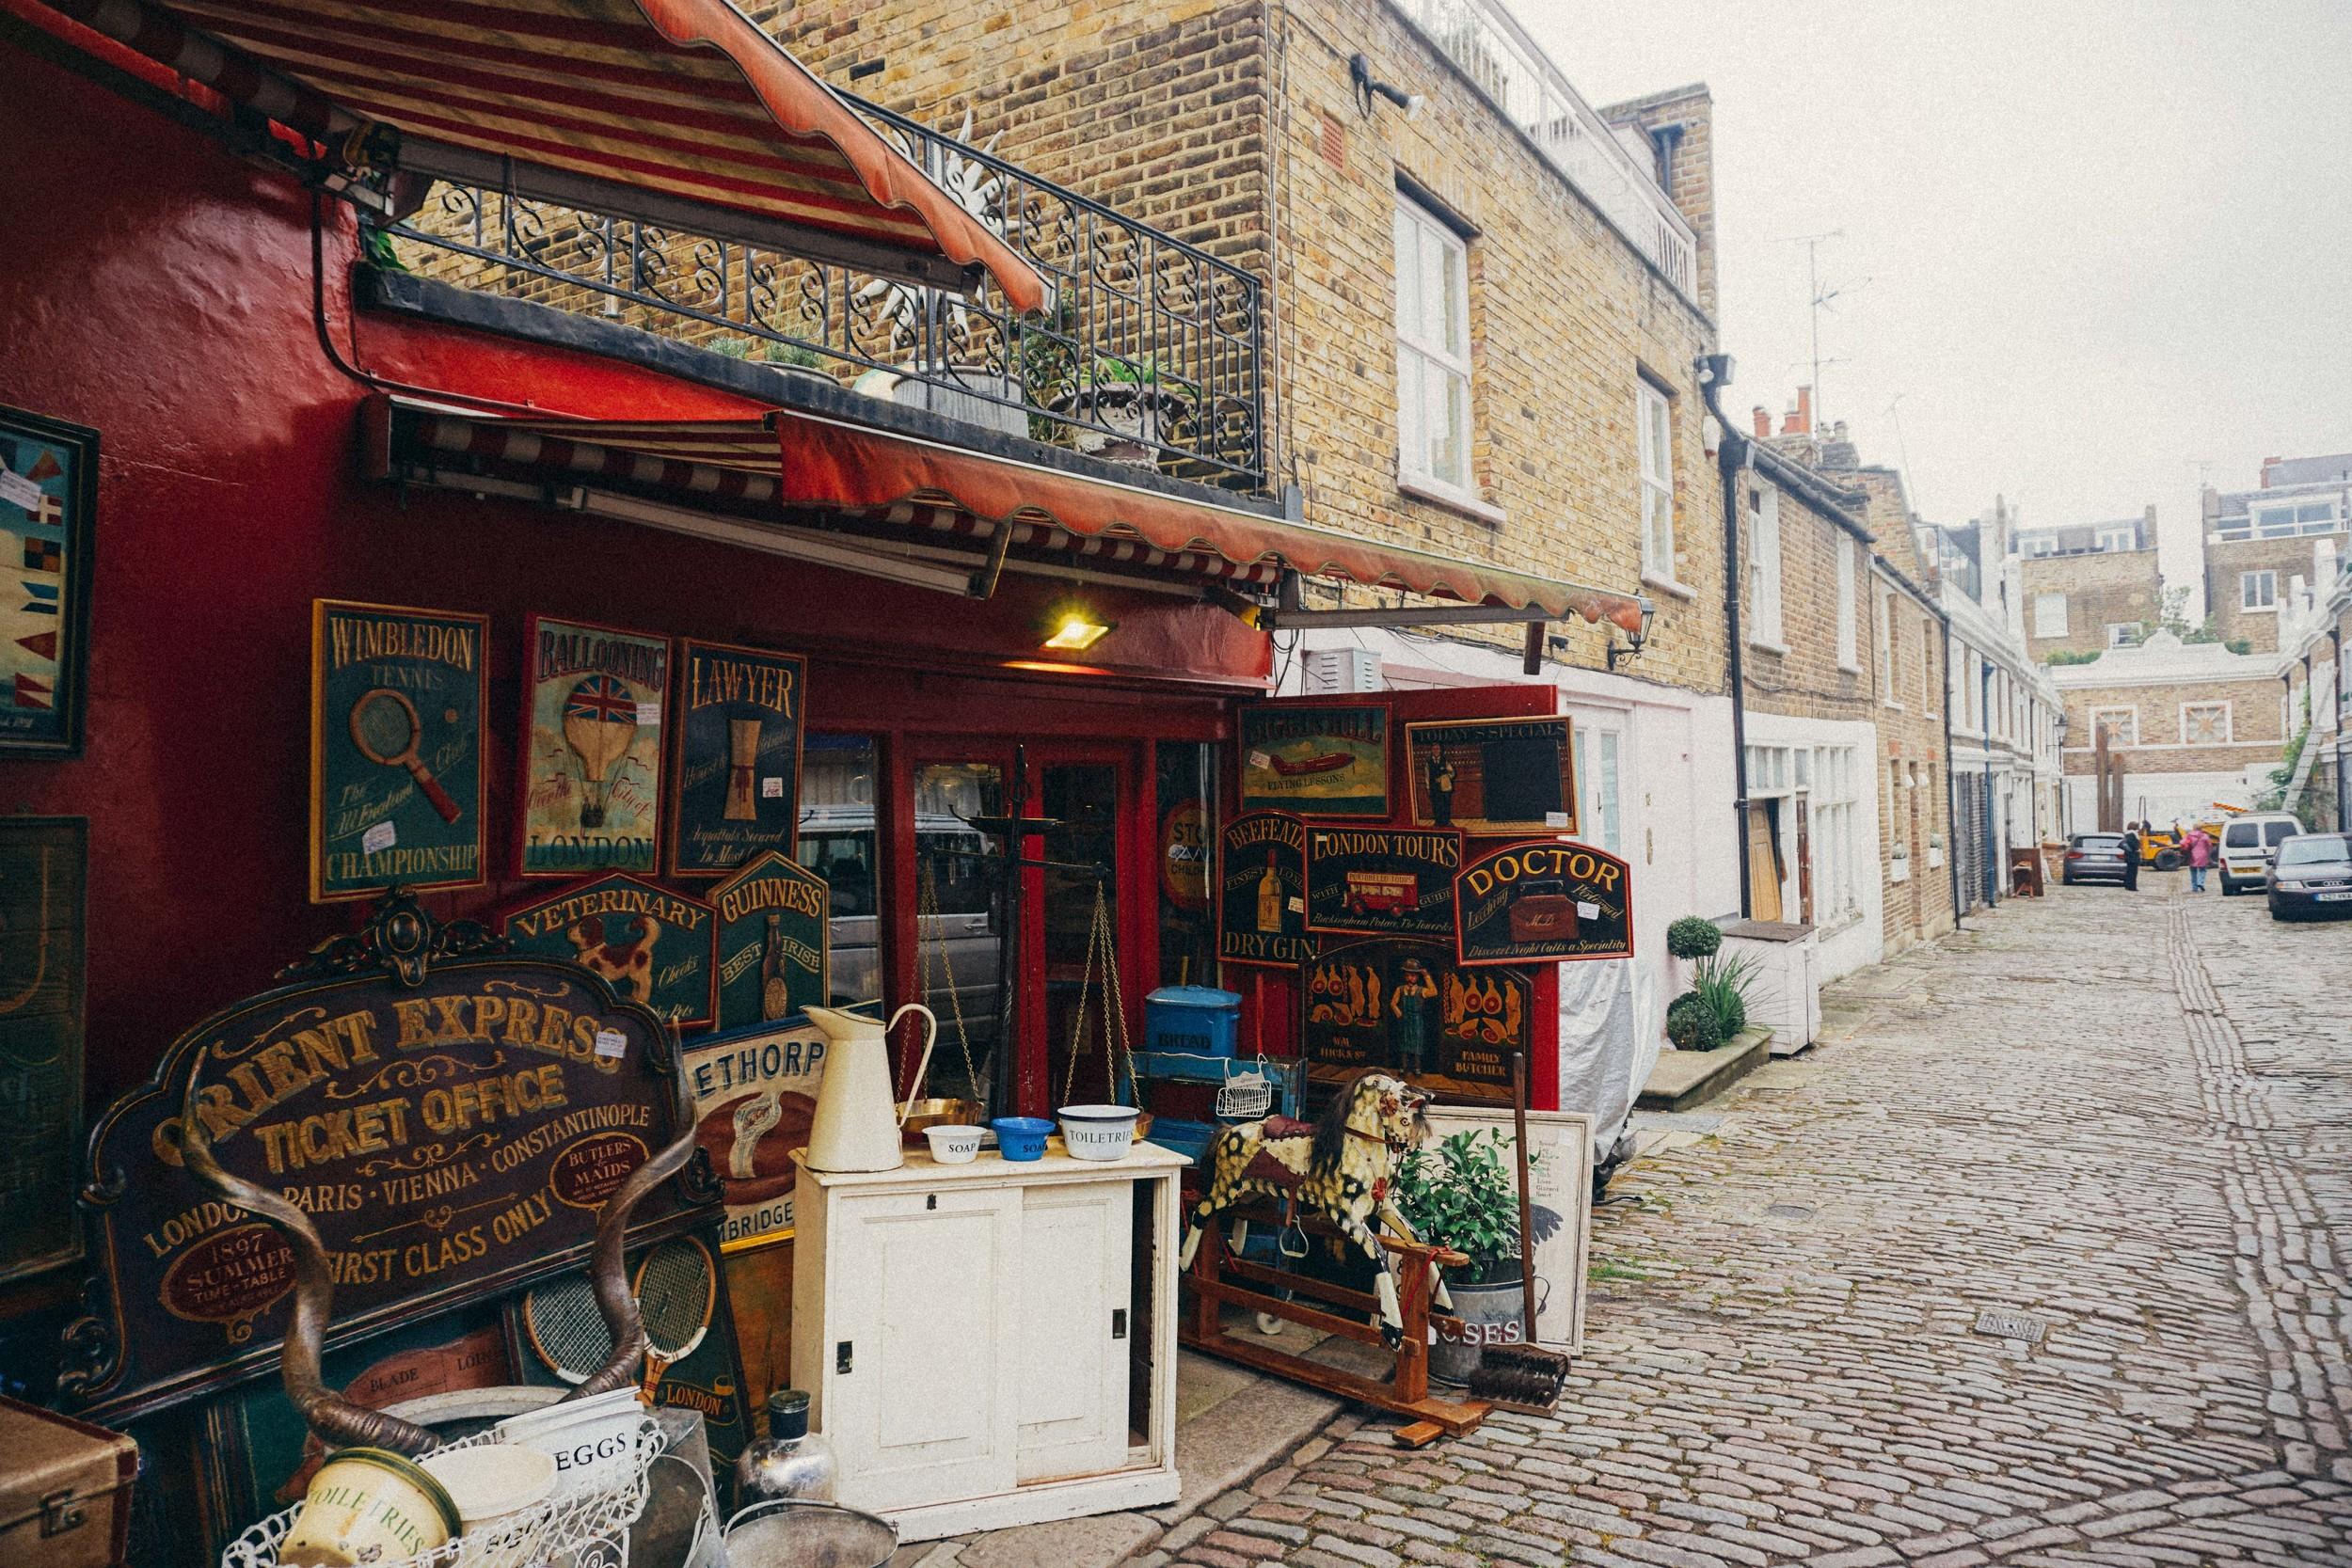 Notting Hill Markets